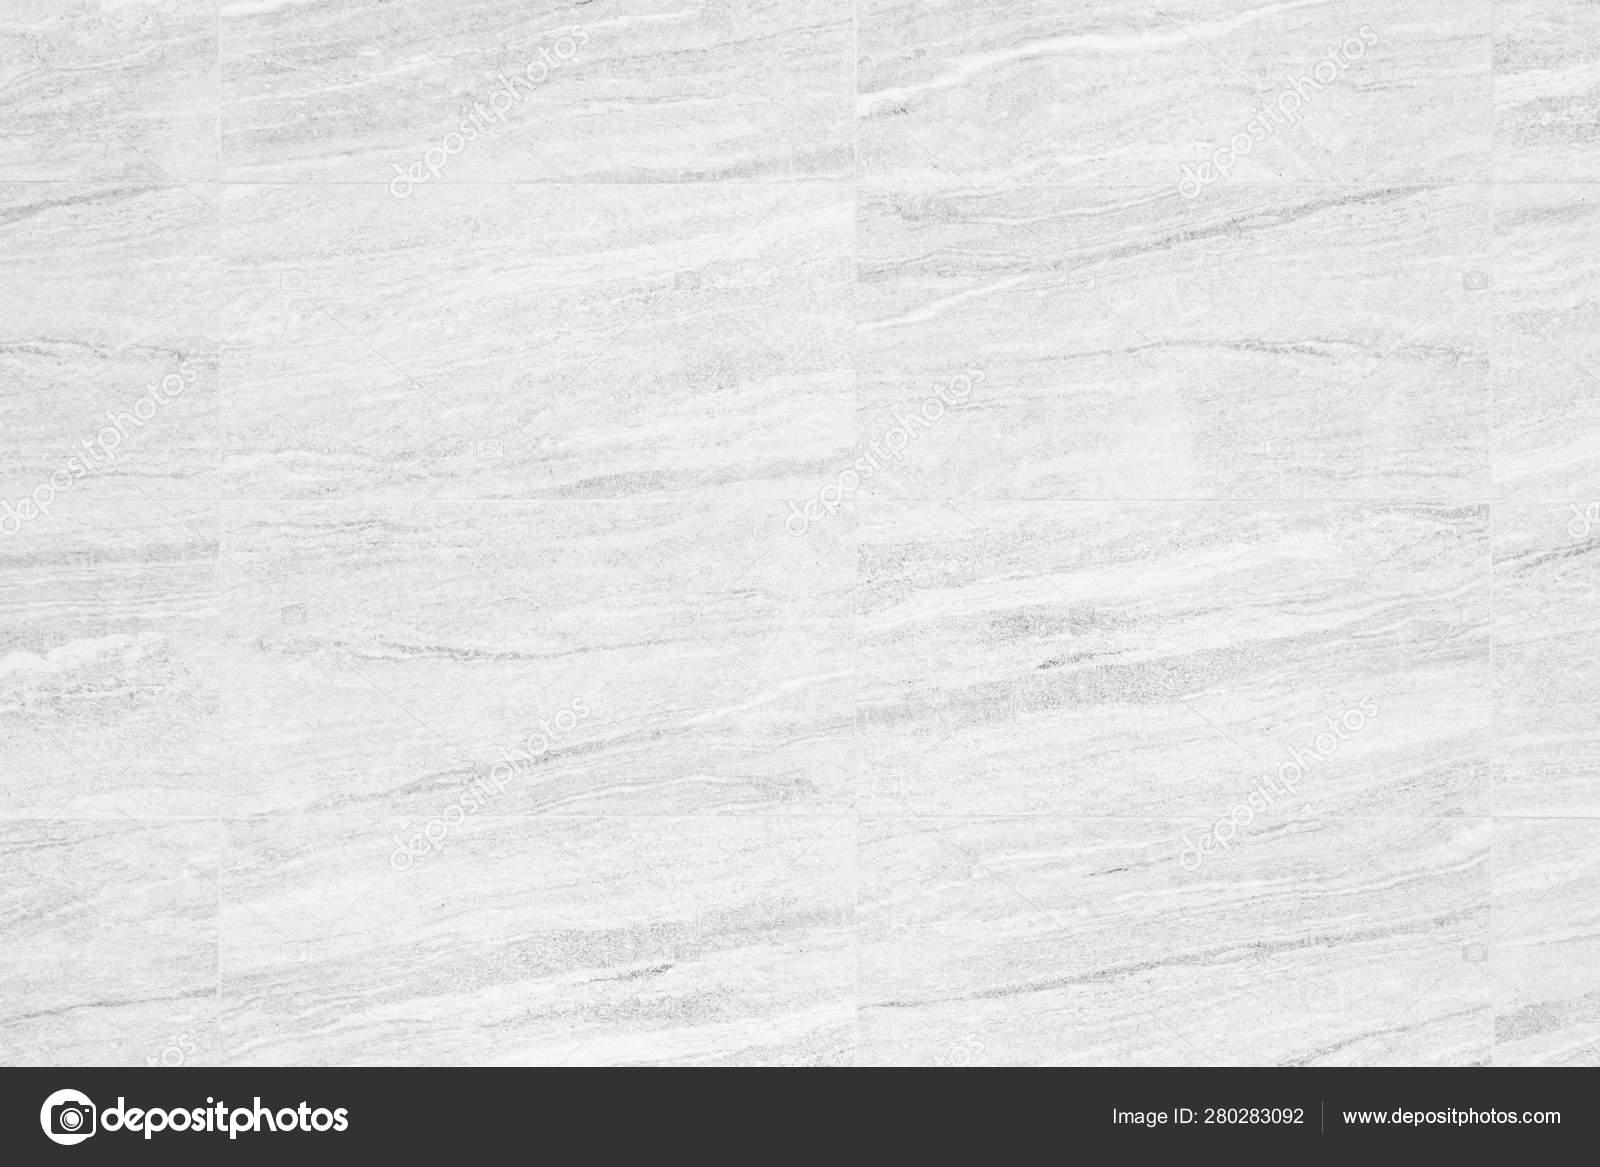 White Marble Texture And Background Or Slate Tile Ceramic Seaml Stock Photo C Phokin2516 Gmail Com 280283092